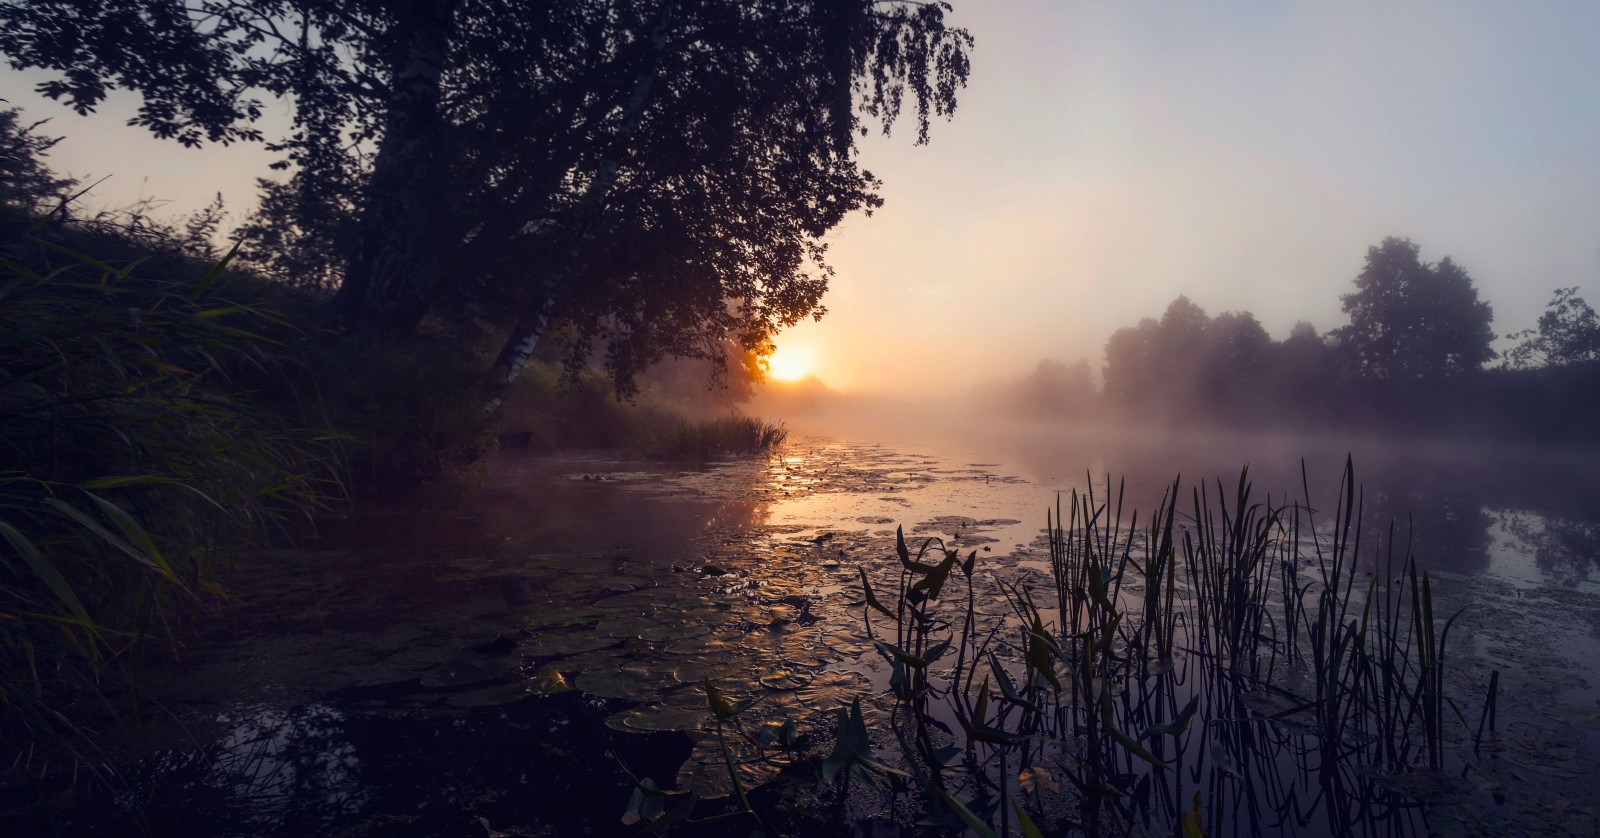 https://rosphoto.com/images/u/ugallery/1510/panoramabeznazvaniya1.jpg